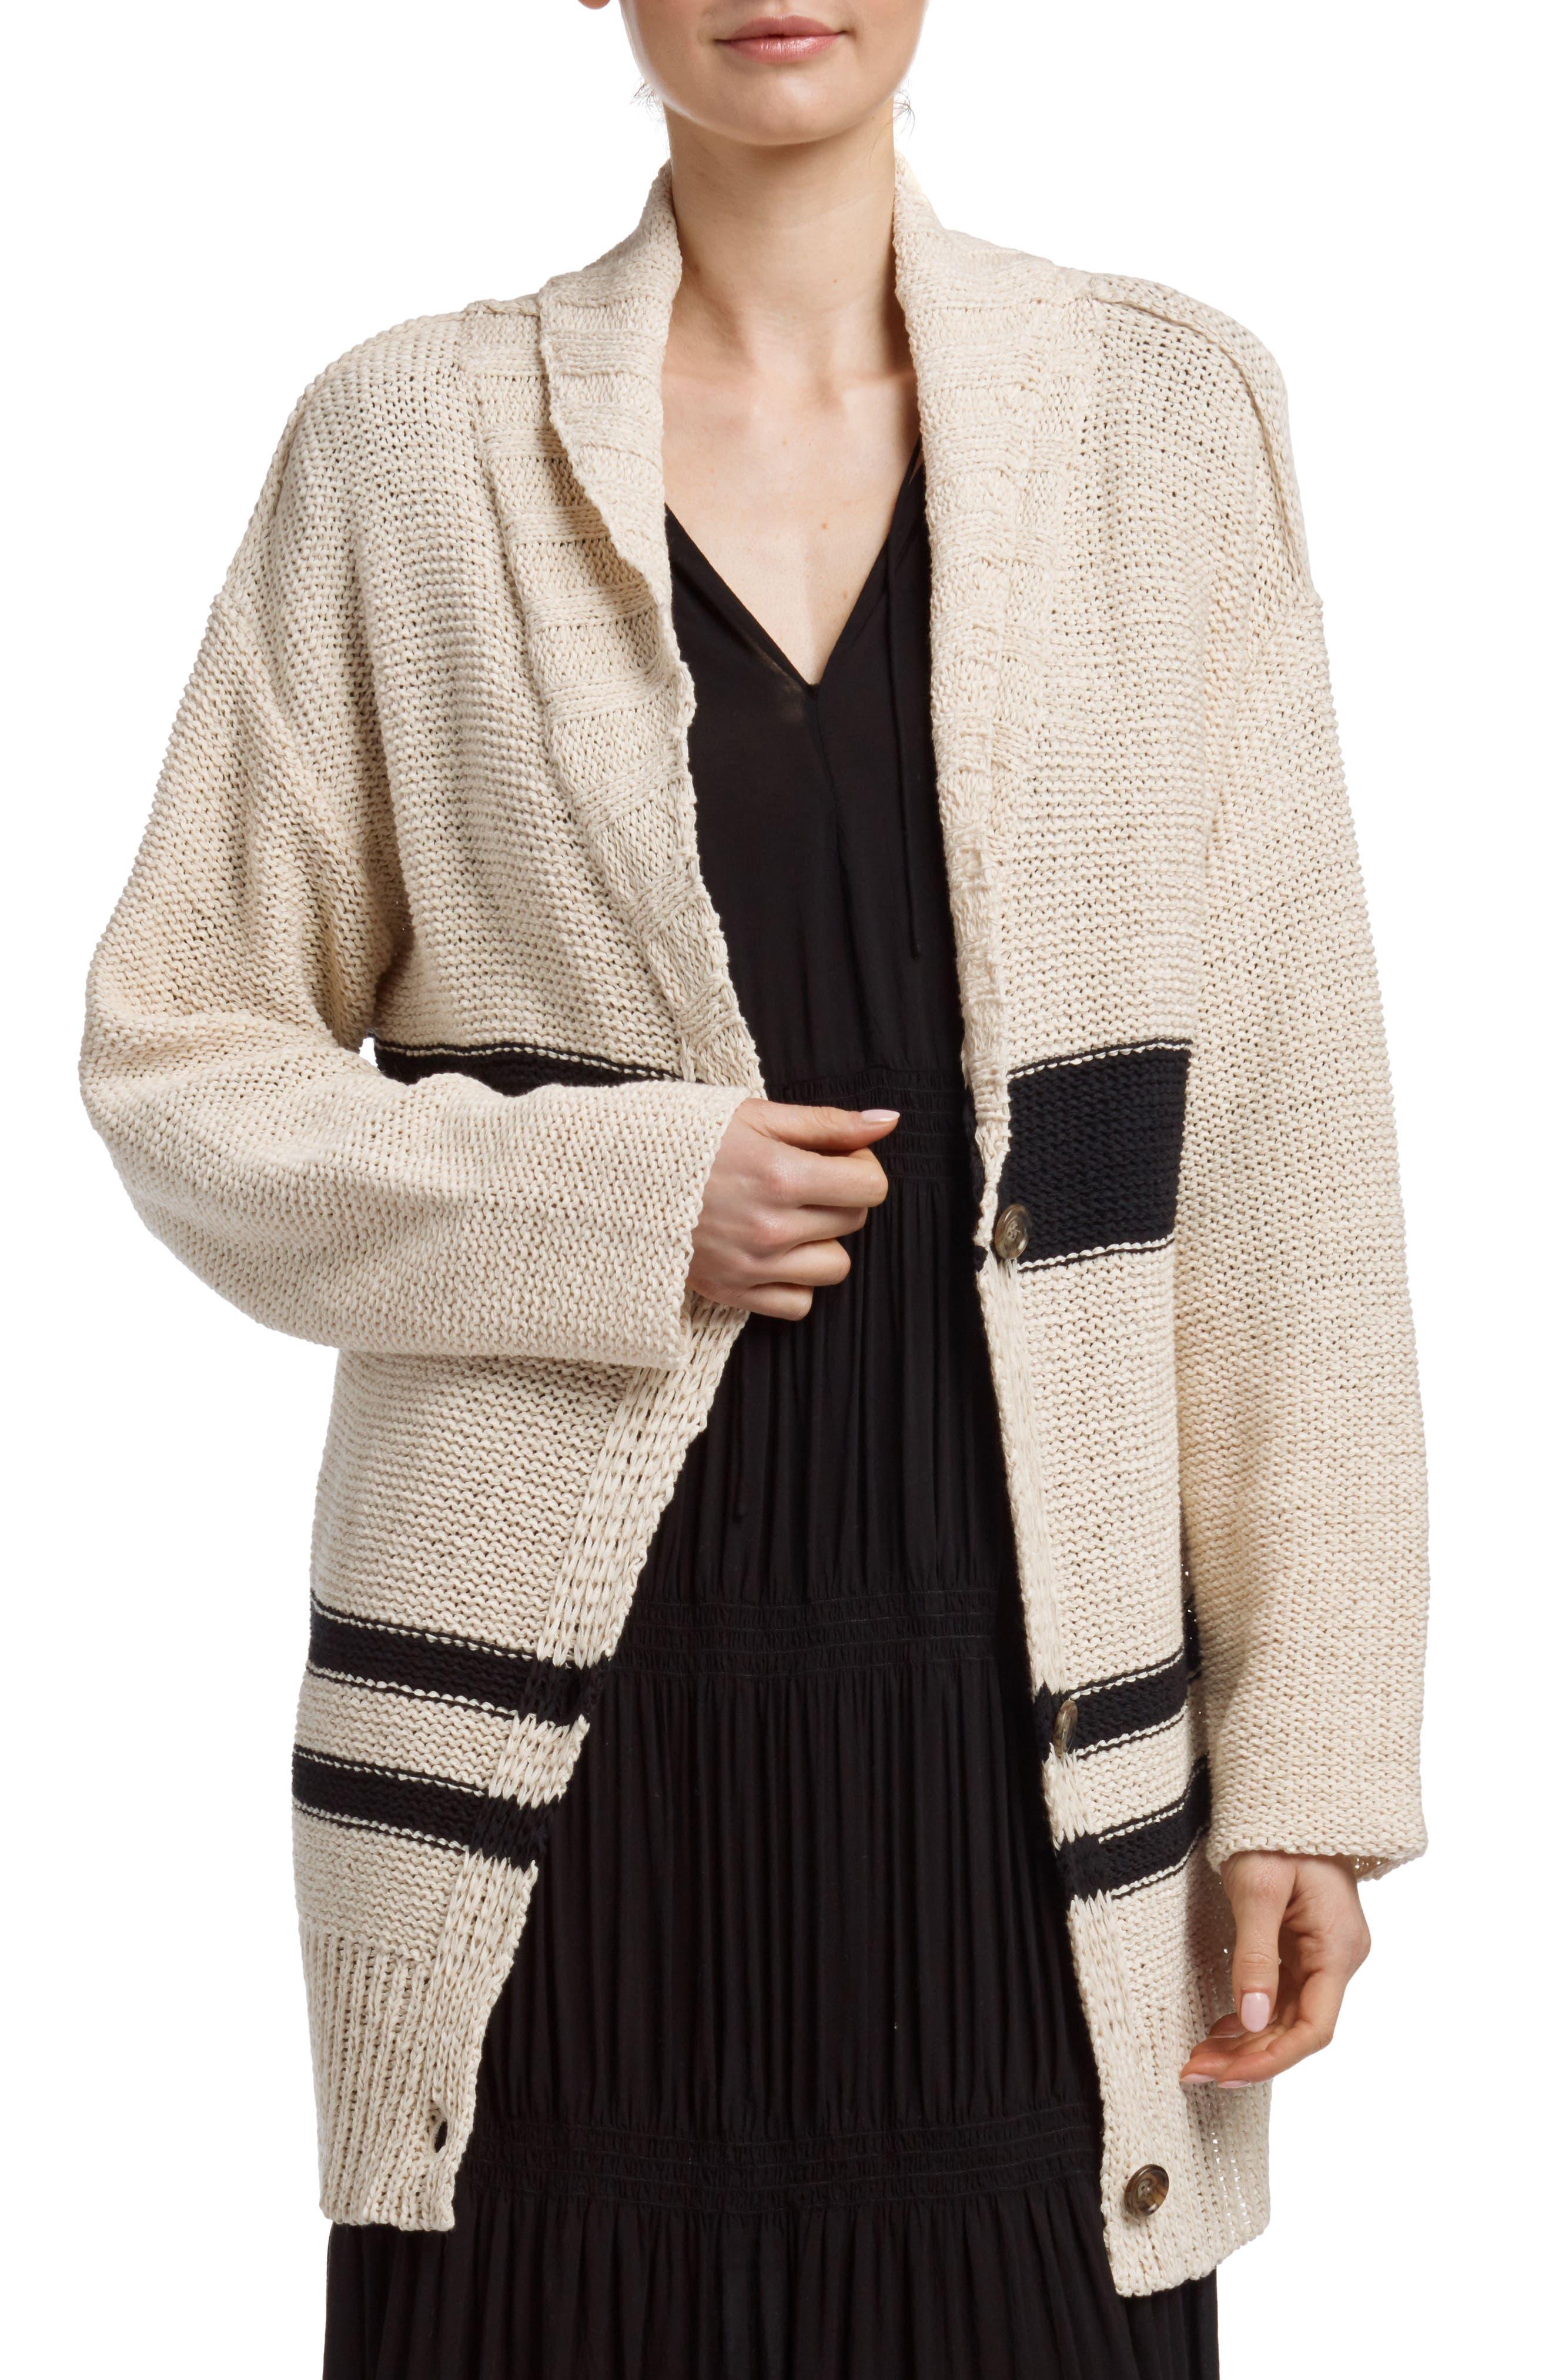 Alternate Image 1 Selected - James Perse Cotton & Linen Blend Beach Sweater